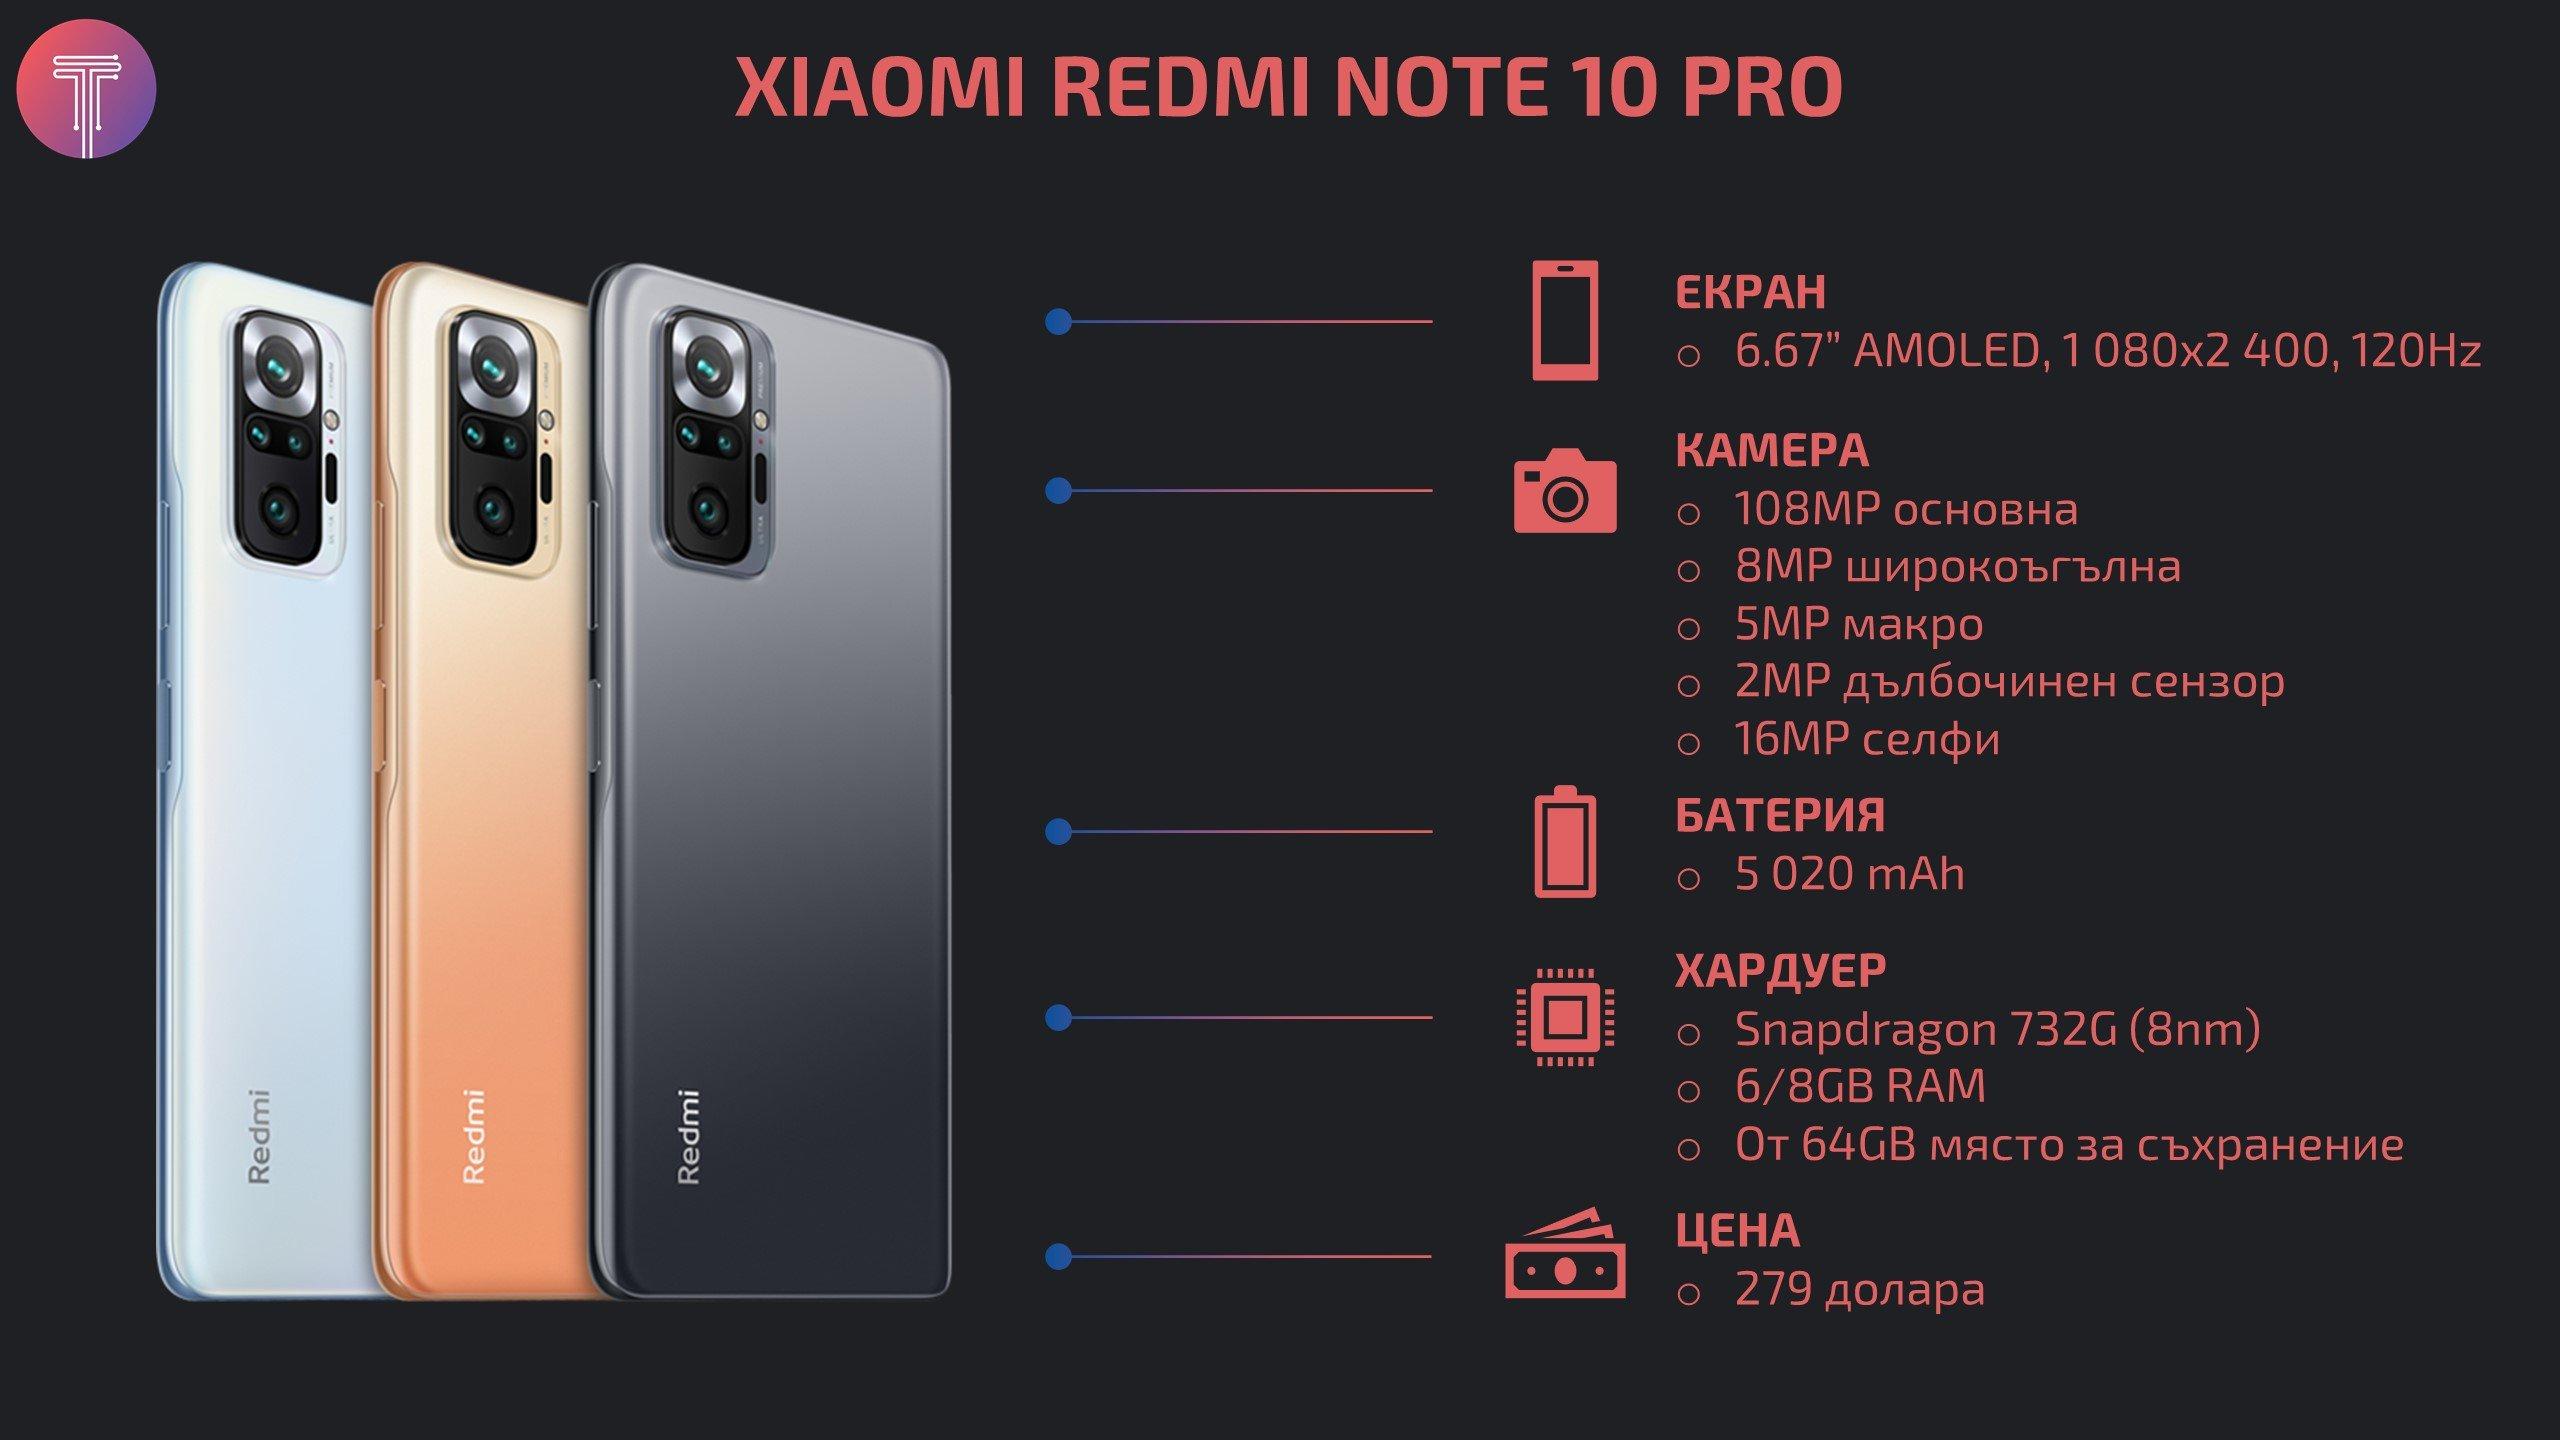 xiaomi-redmi-note-10-pro-specs